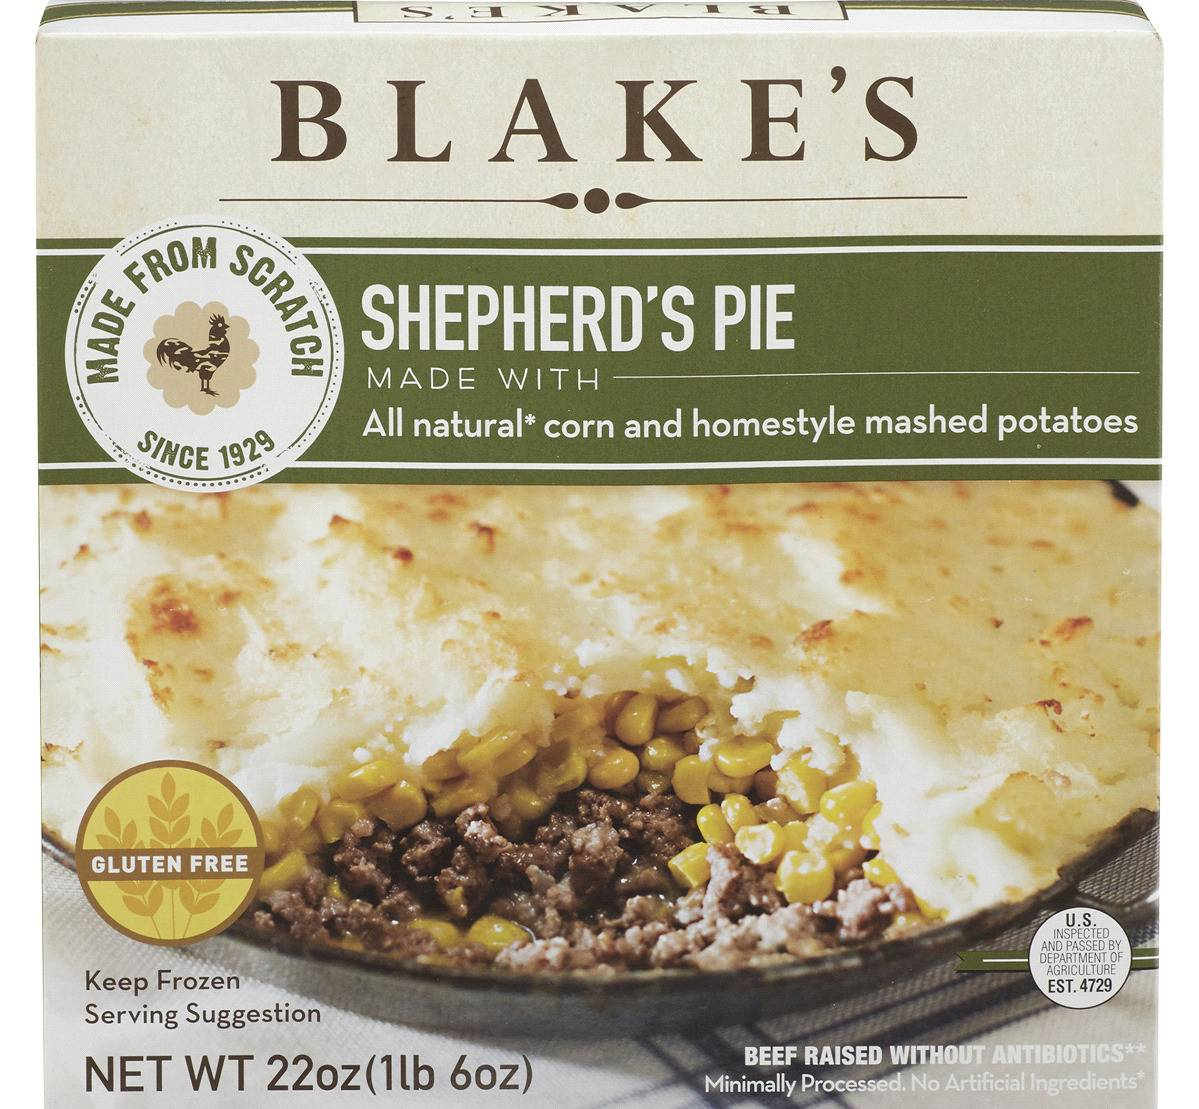 blakes-shepherds-pie